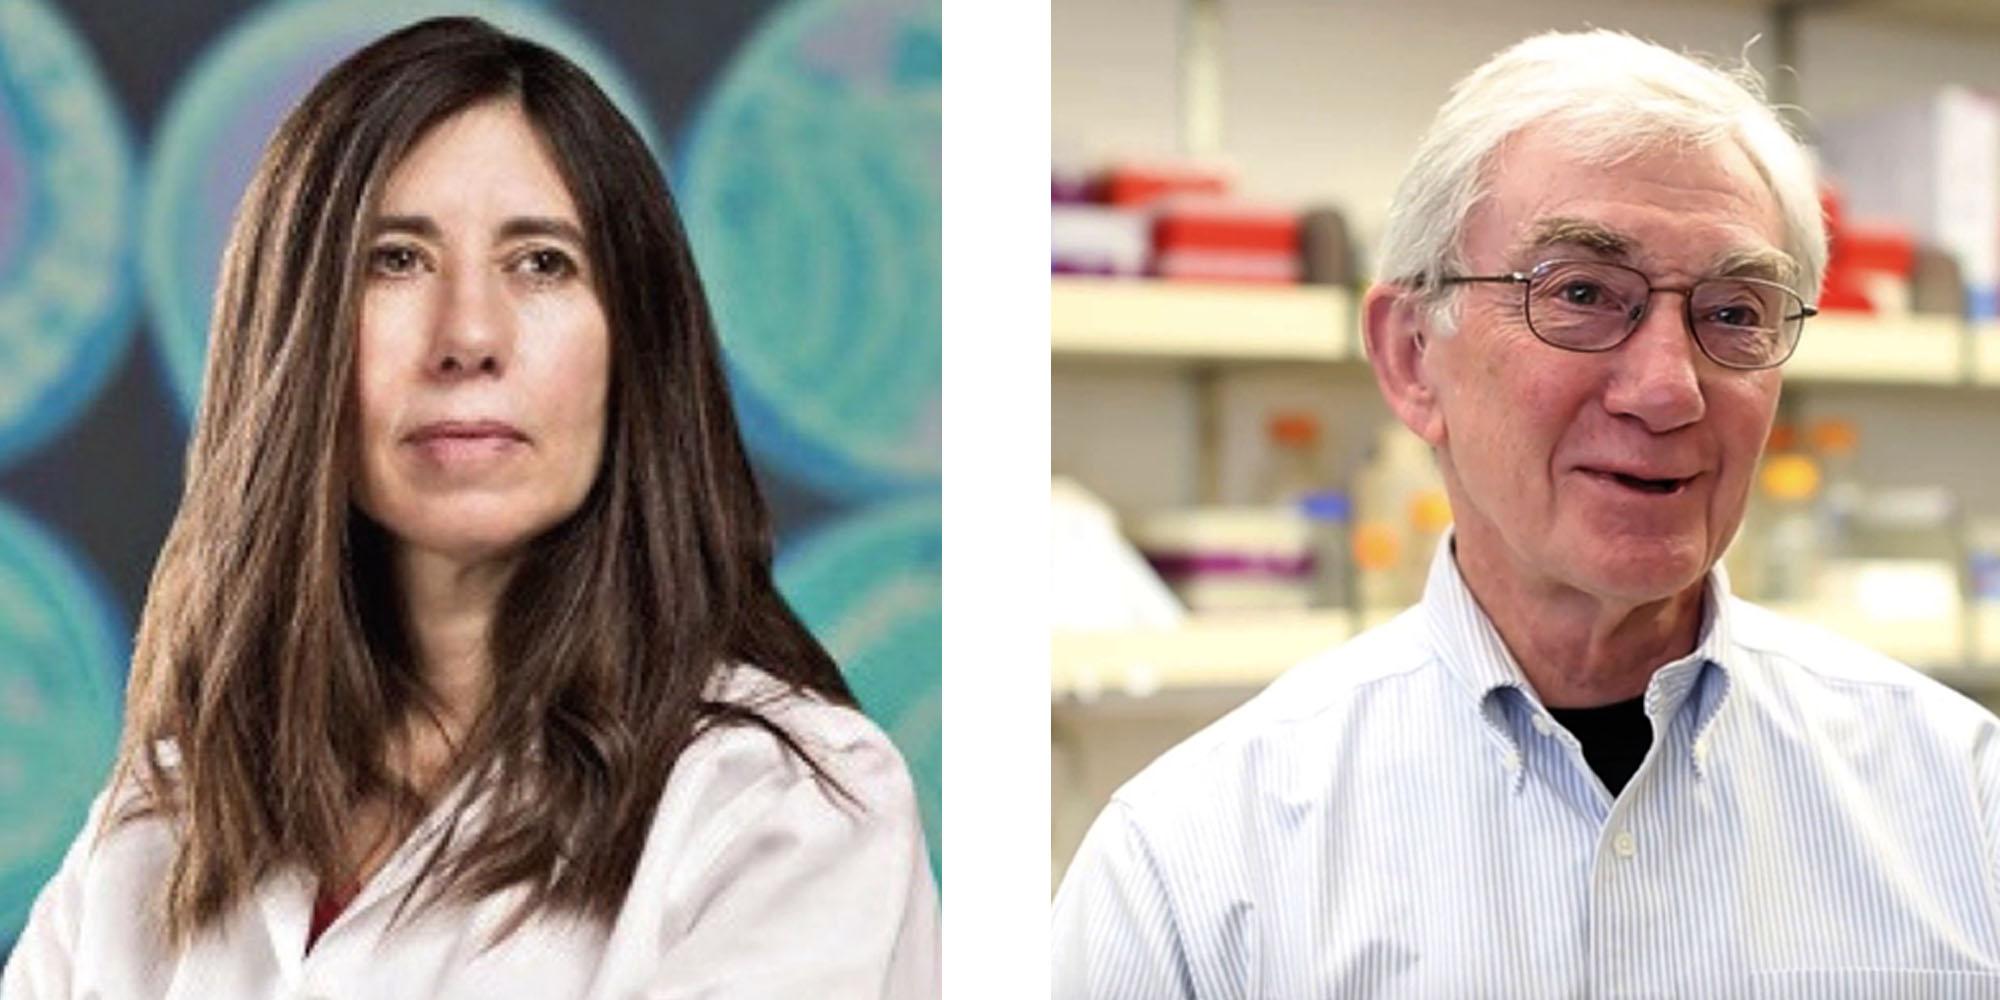 GWG 2018 Keynote speakers: Dr. Ellen Jorgensen, Founder, Biotech Without Borders and Genspace, NYC and Dr. Dana Carroll, University of Utah School of Medicine